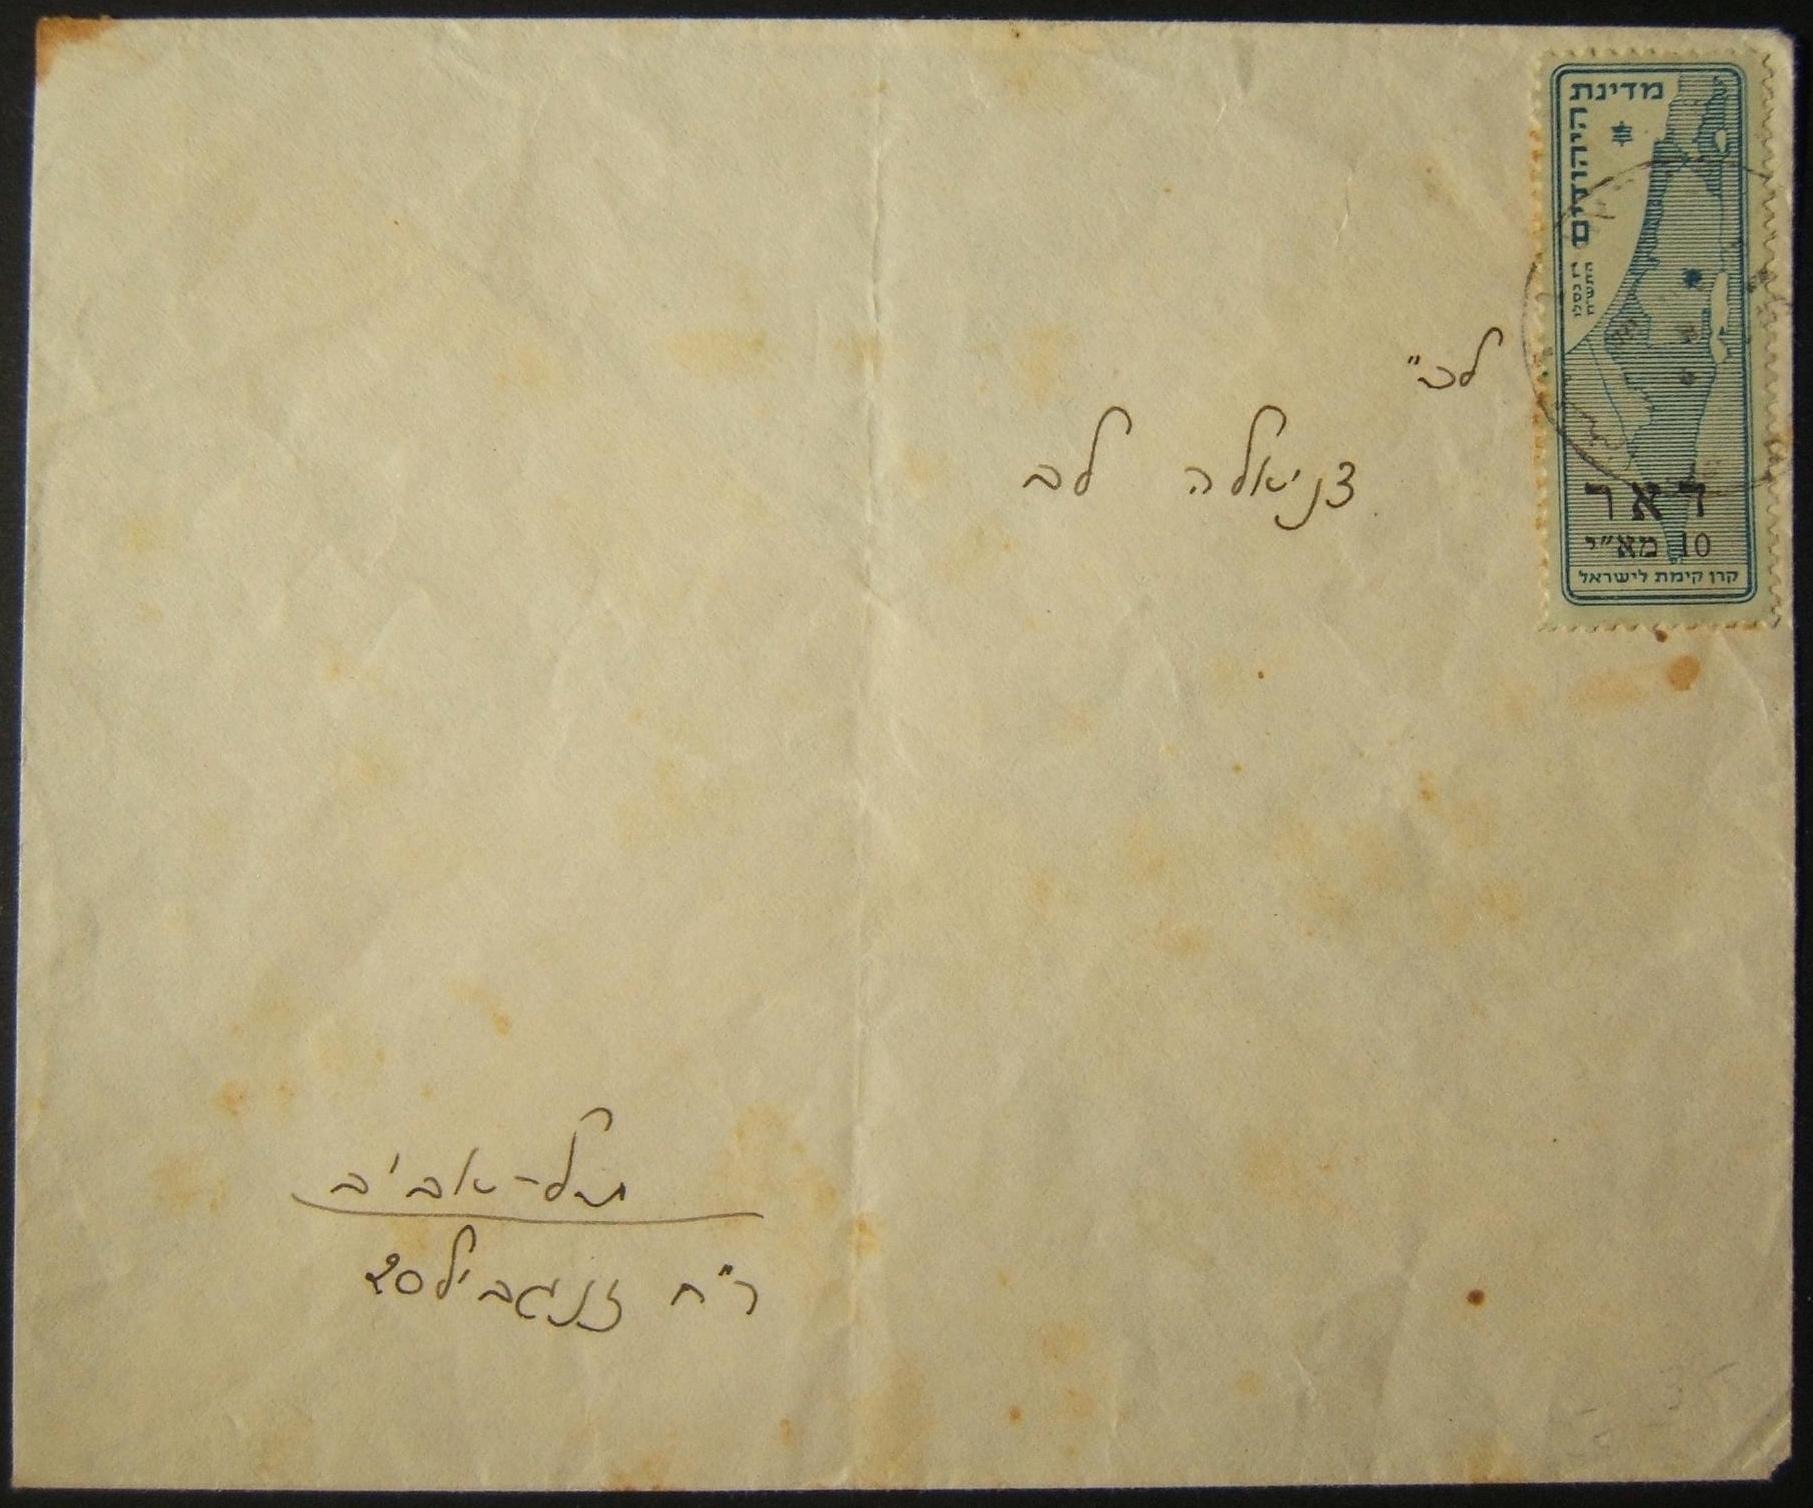 1948 JERUSALEM siege period couriered/flown? mail to TEL AVIV postmarked 23-06-1948